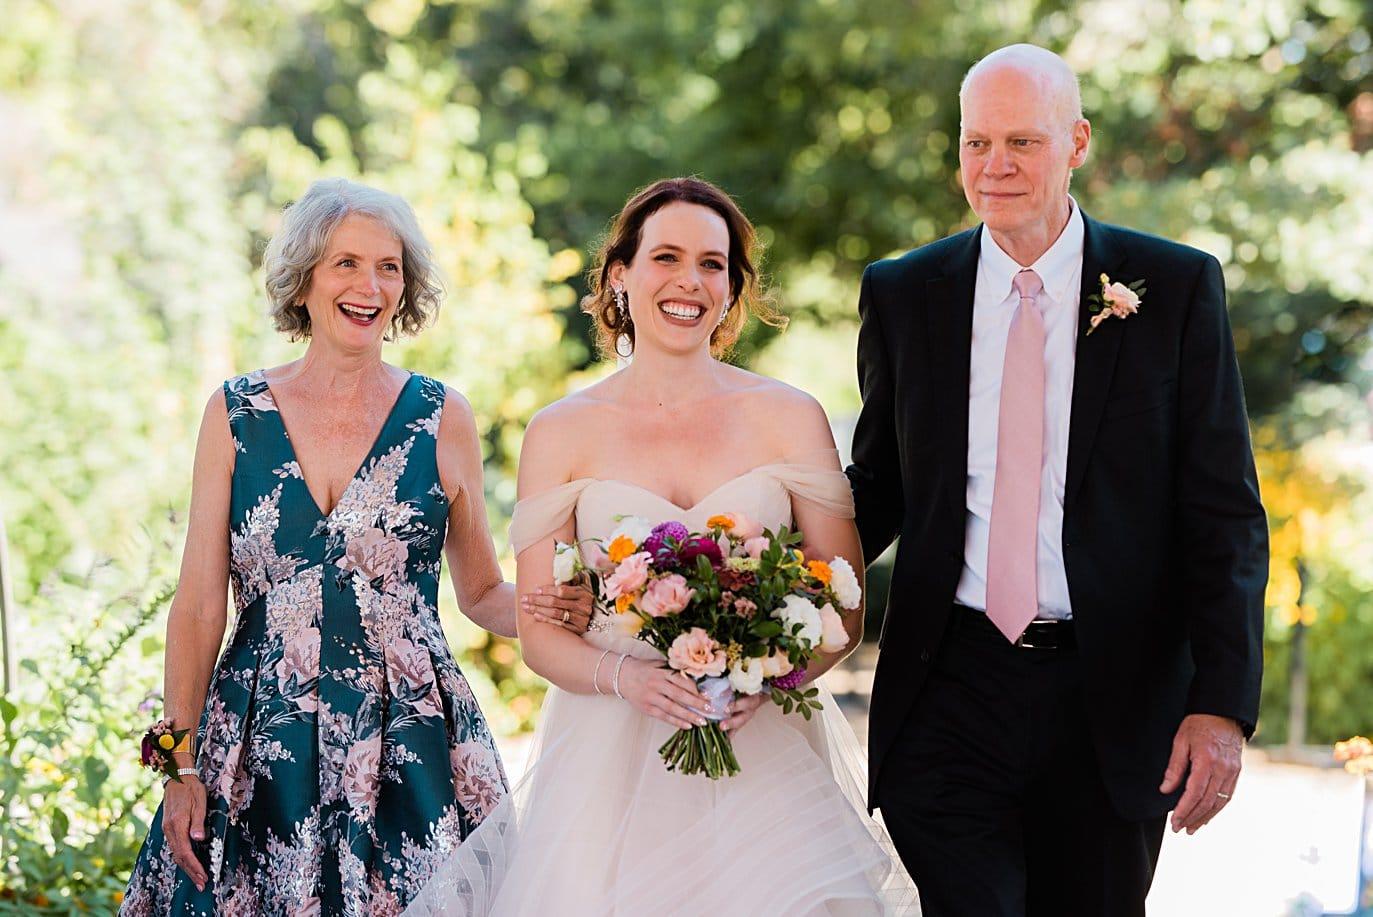 bride walks down aisle with parents at Denver Botanic Gardens microwedding by Denver wedding photographer Jennie Crate